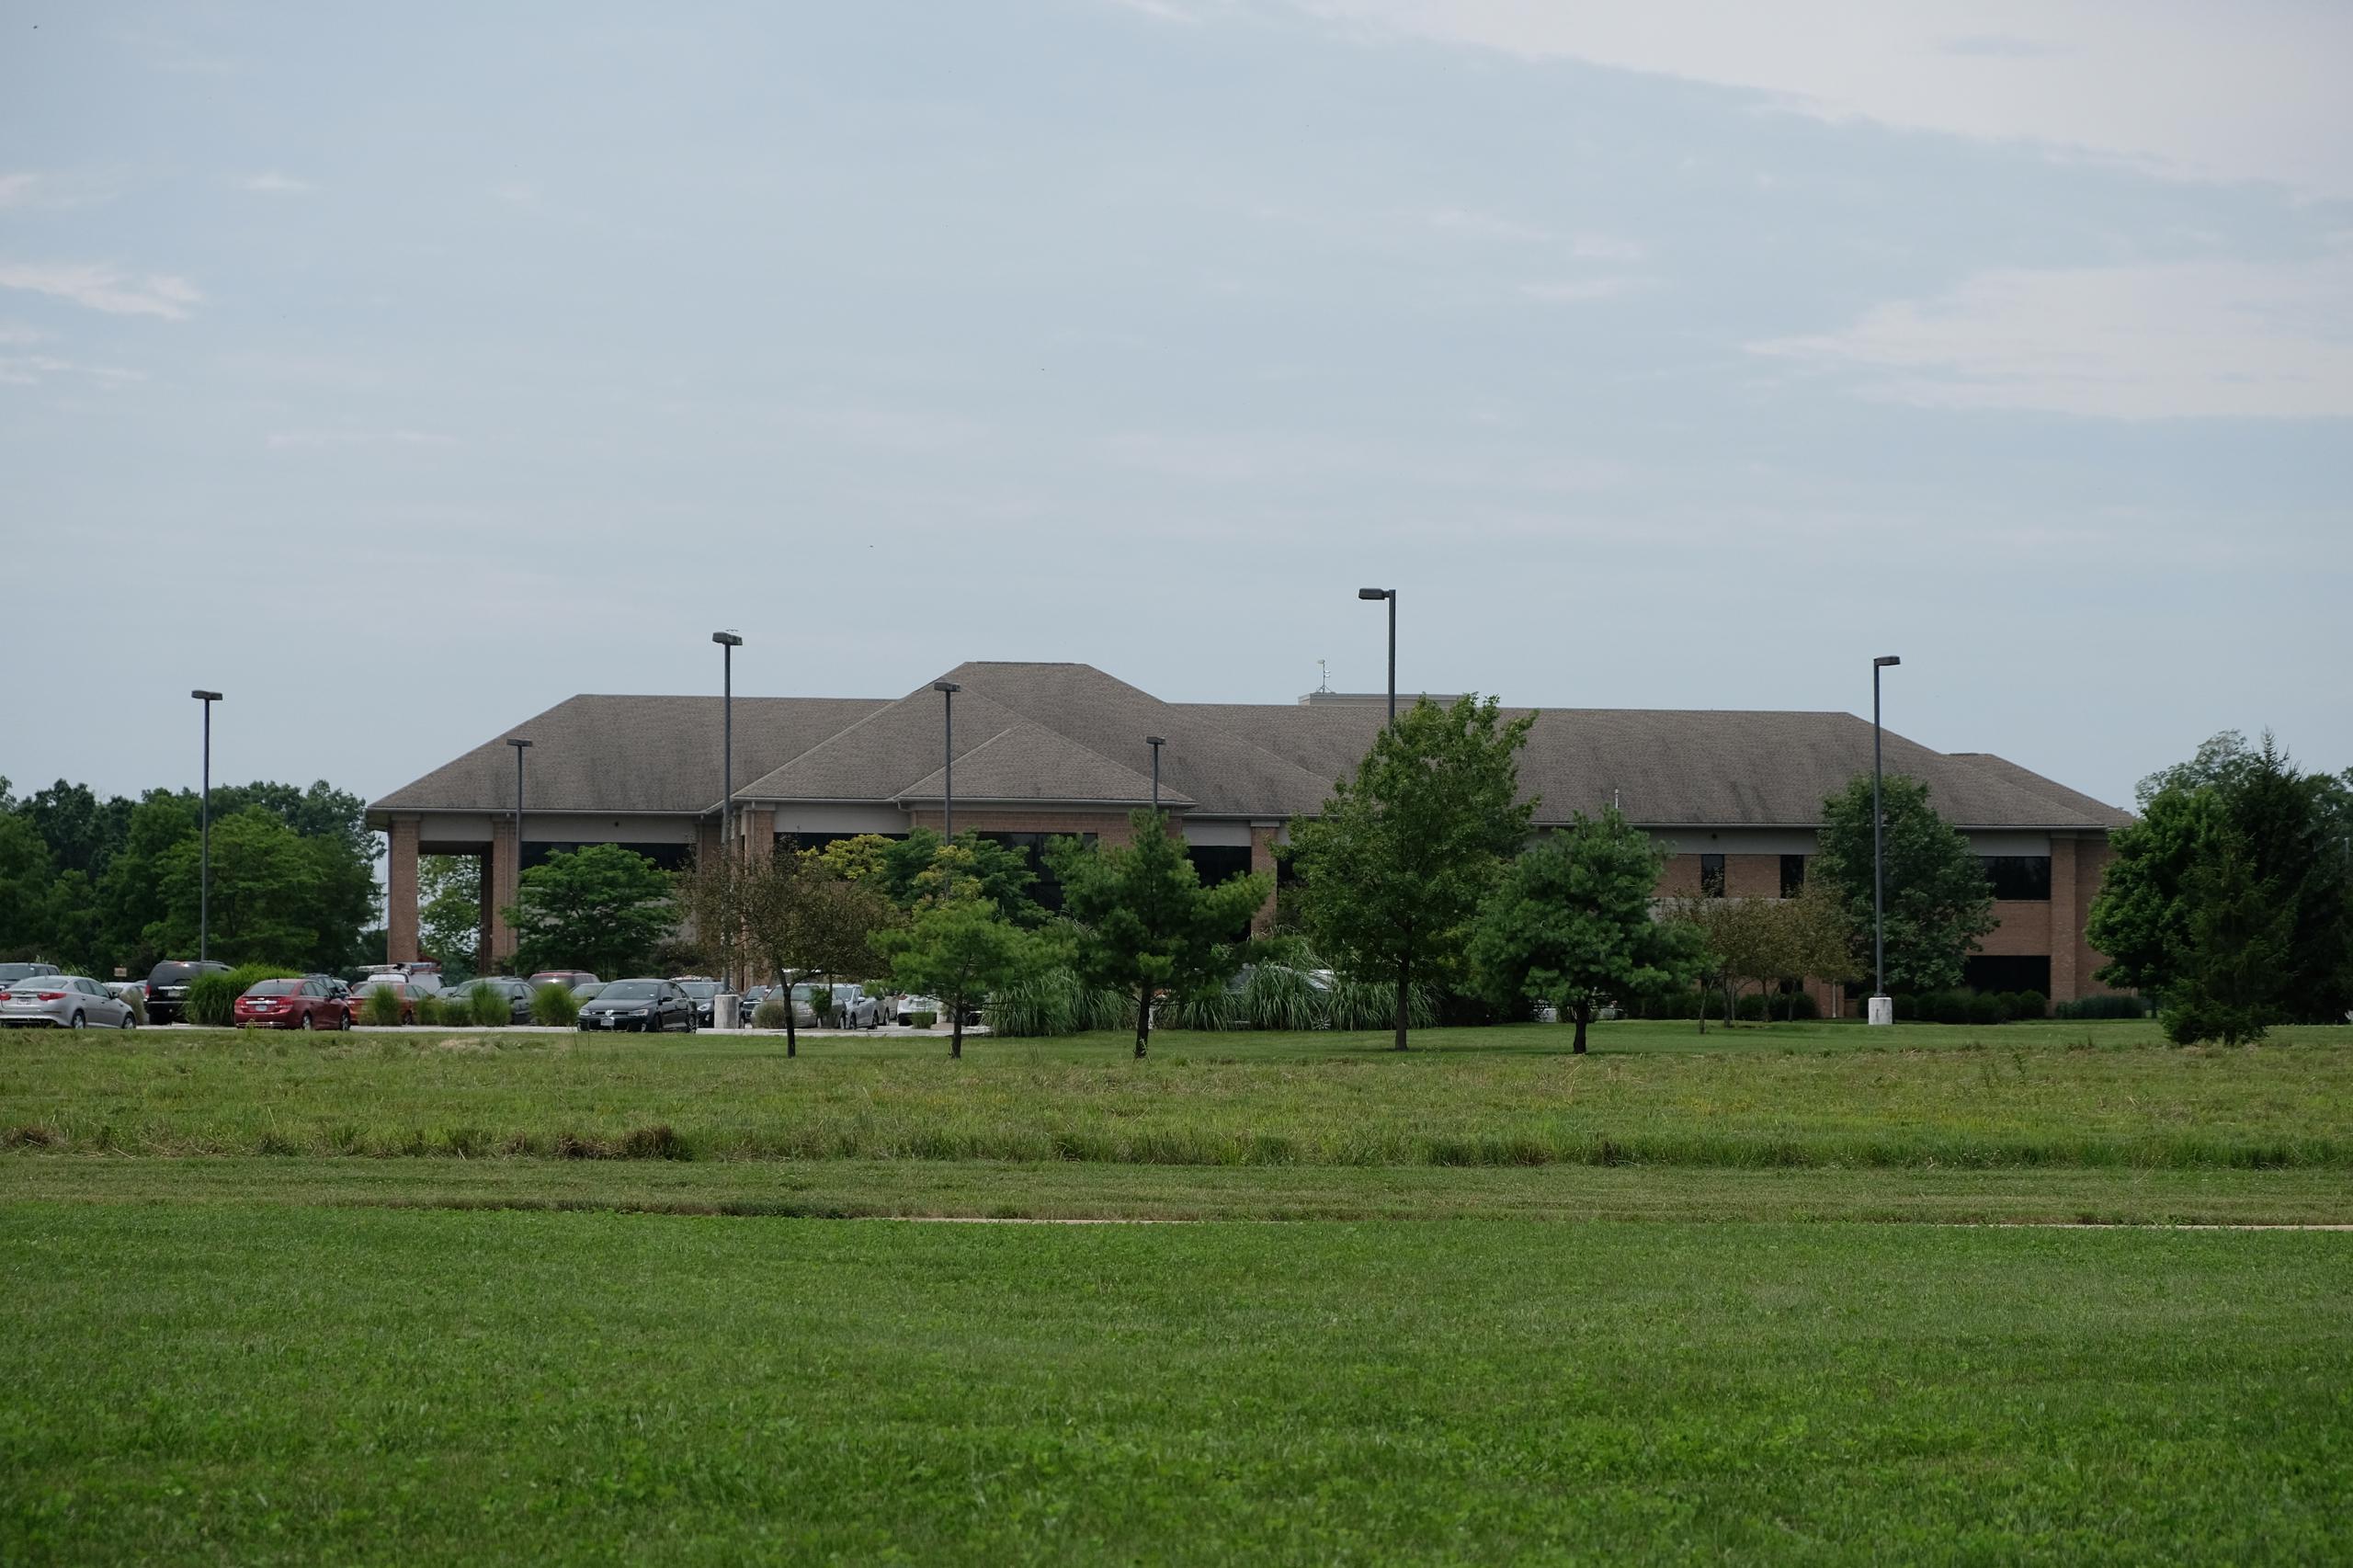 Greif's corporate headquarters in Delaware, Ohio.